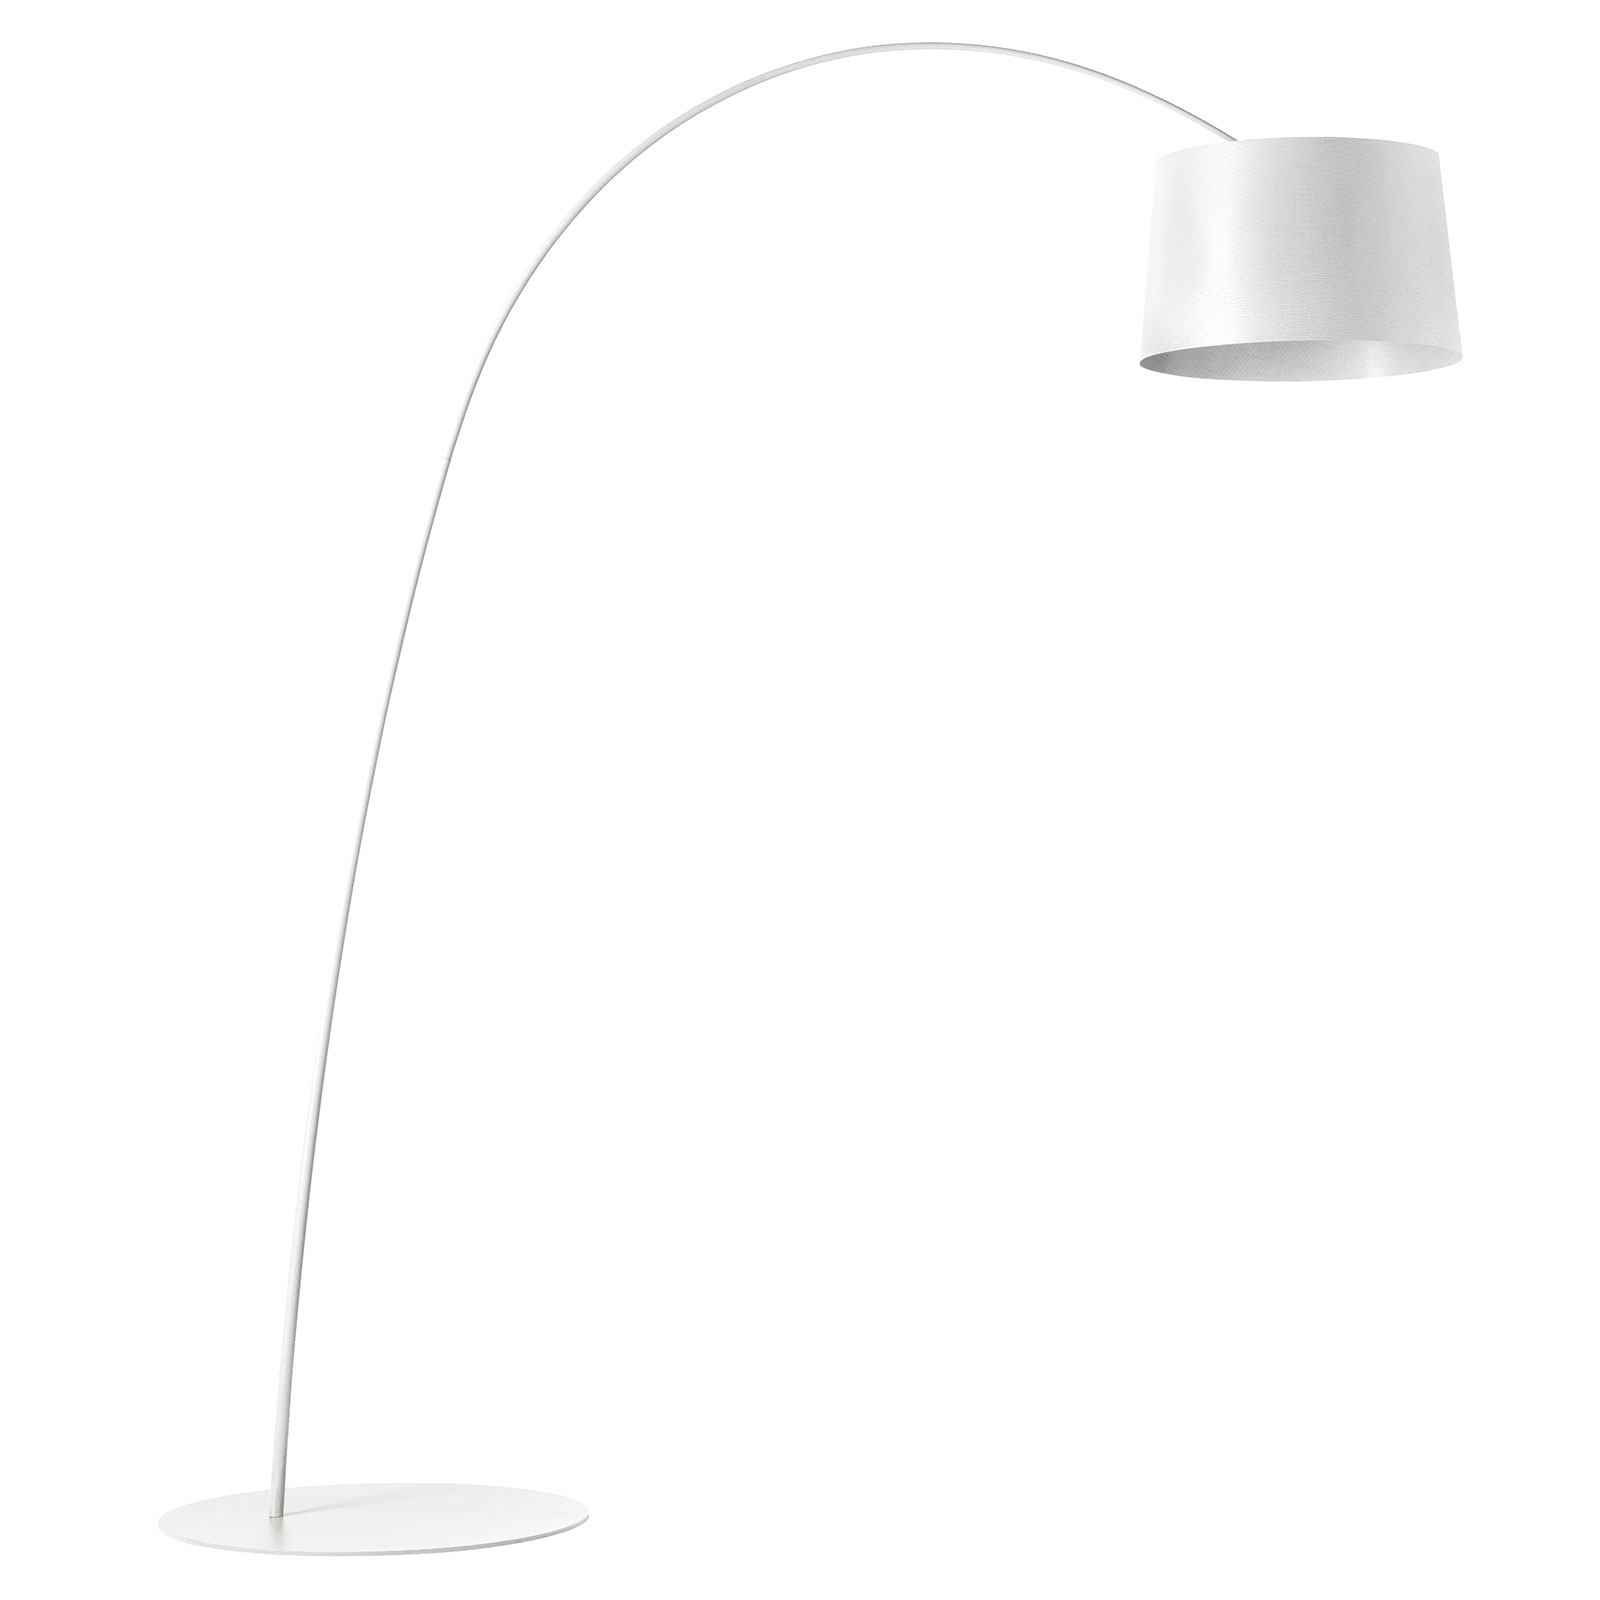 Acquista Foscarini Twiggy Lampada Led Ad Arco Bianco Lampade It